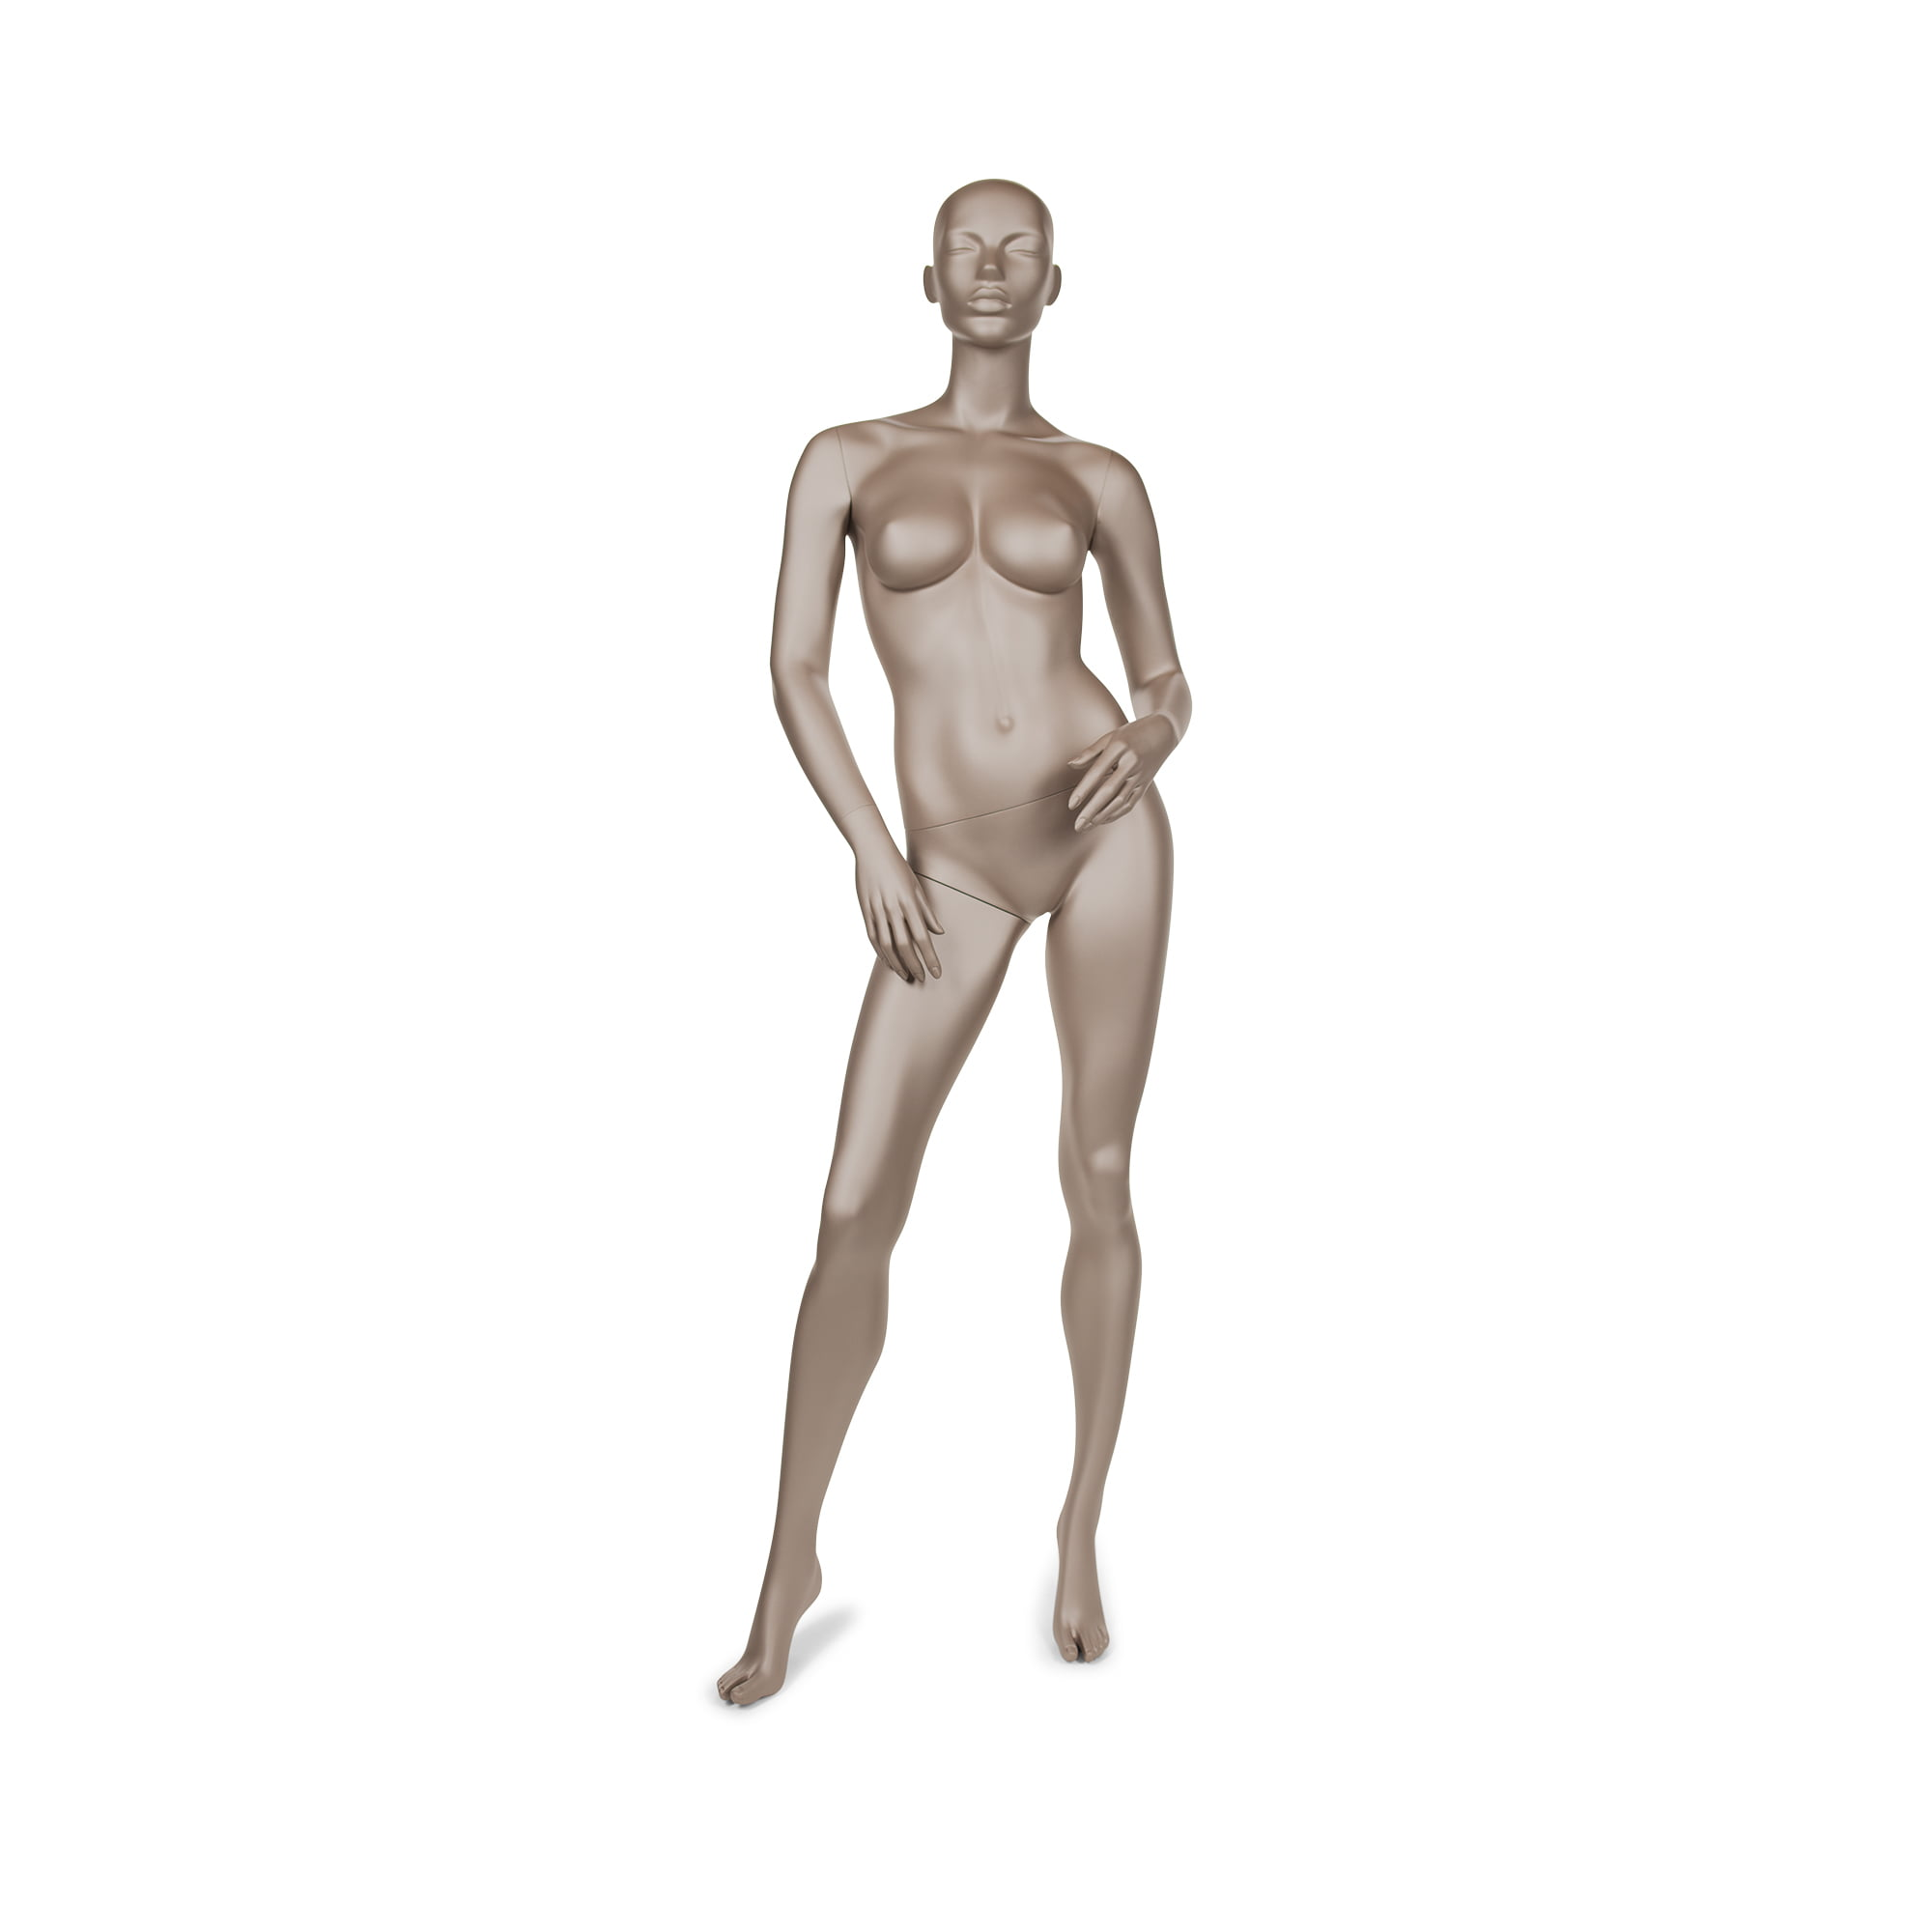 "Manechin Femeie Intimacy Mat 8 Colectia ""Intimacy Mat"""